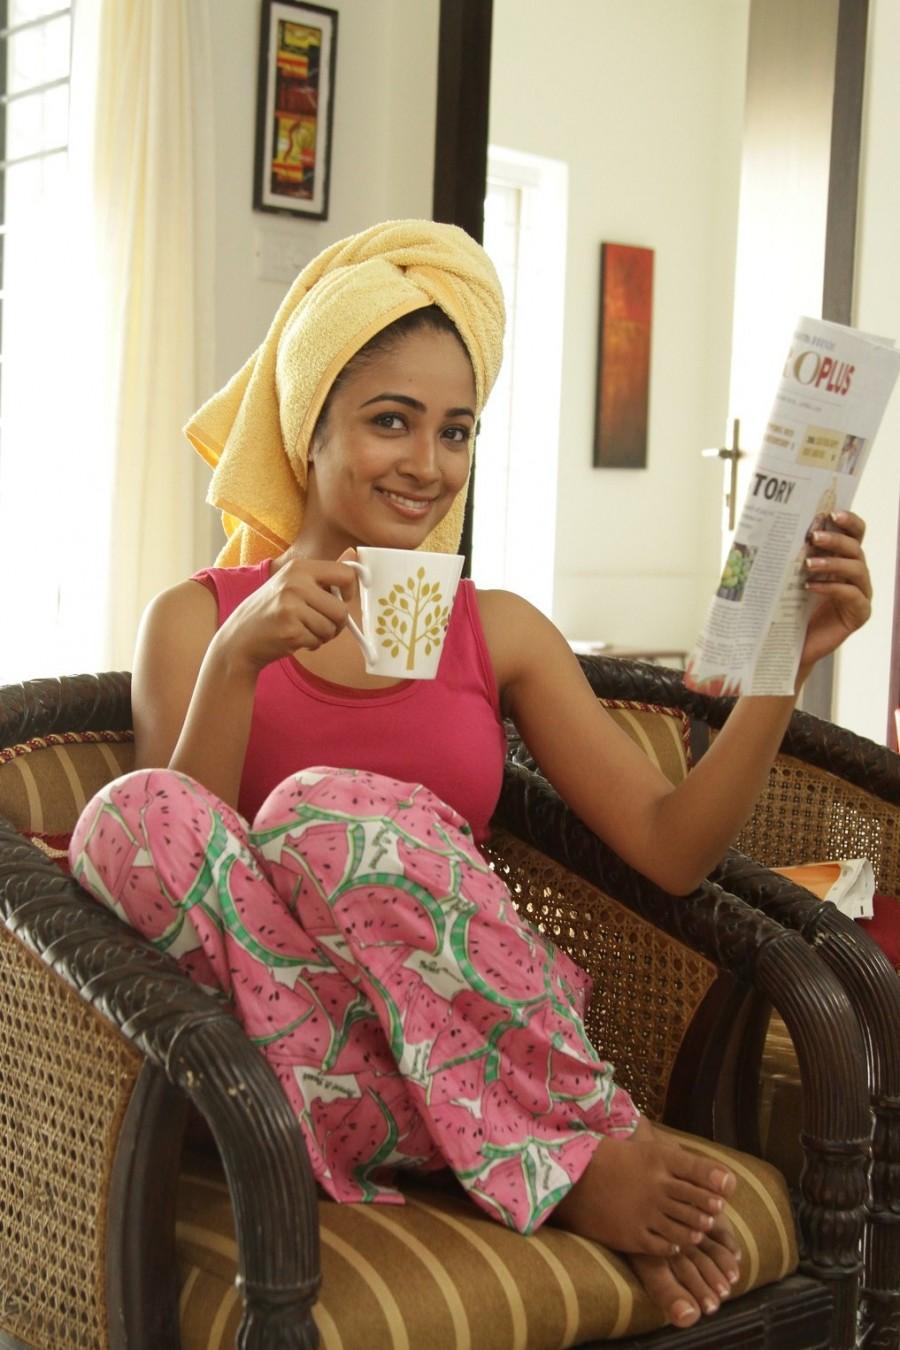 Aditi Chengappa,actress Aditi Chengappa,south indian actress Aditi Chengappa,Aditi Chengappa pics,Aditi Chengappa images,Aditi Chengappa stills,Aditi Chengappa photos